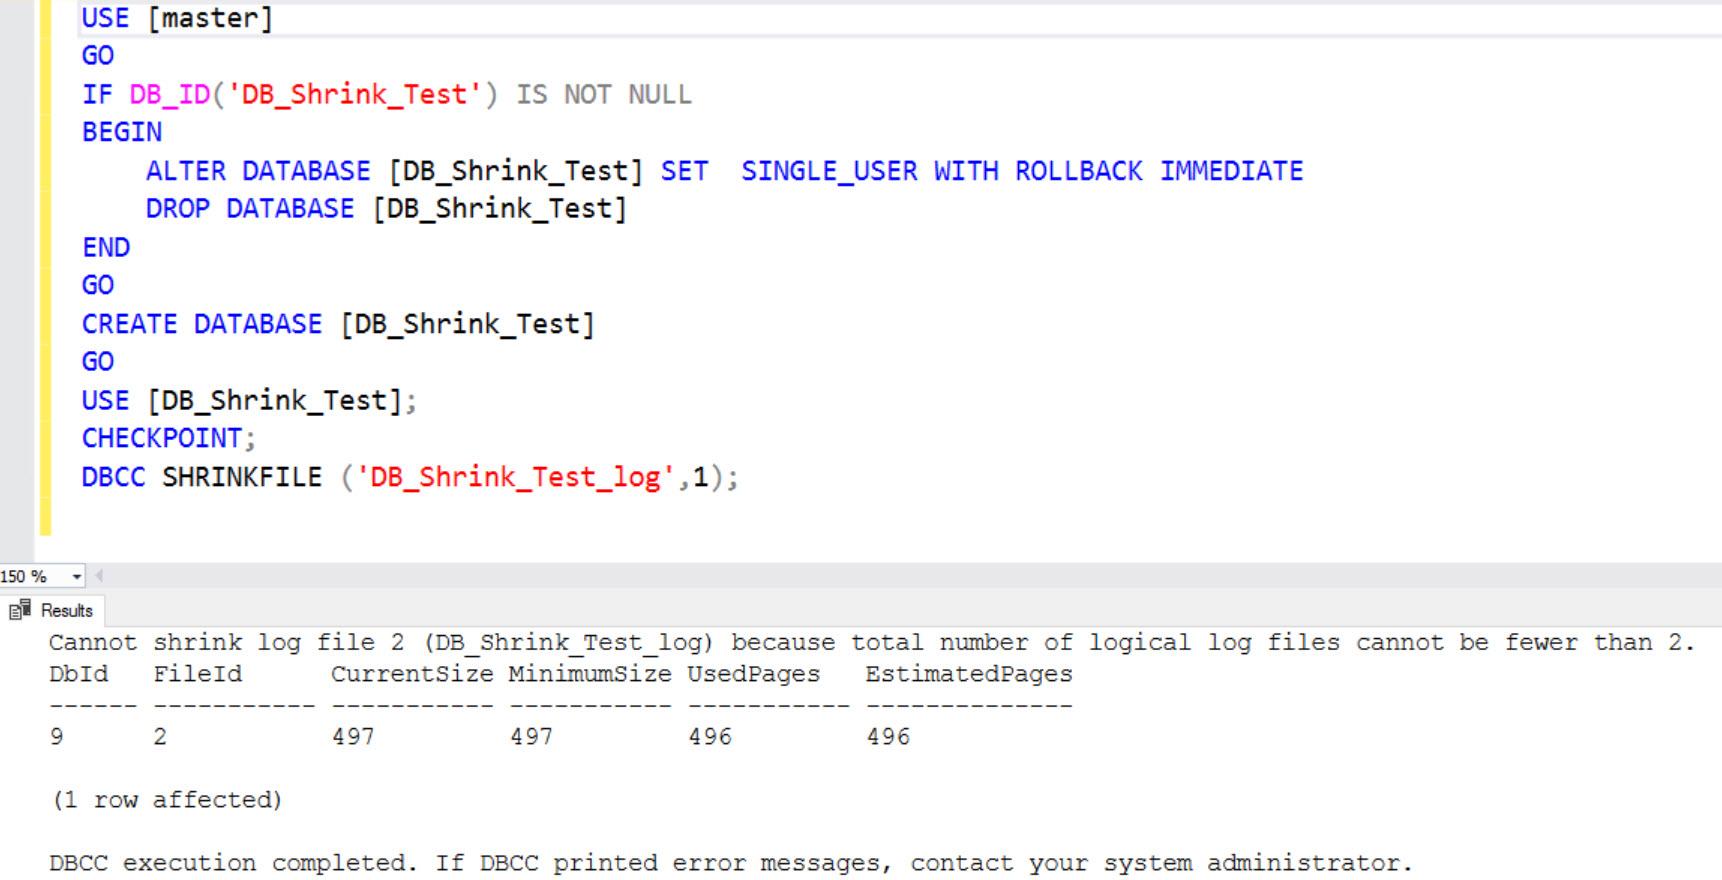 SQL SERVER - Cannot Shrink Log File Because Total Number of Logical Log Files Cannot be Fewer than 2 shrink2-01